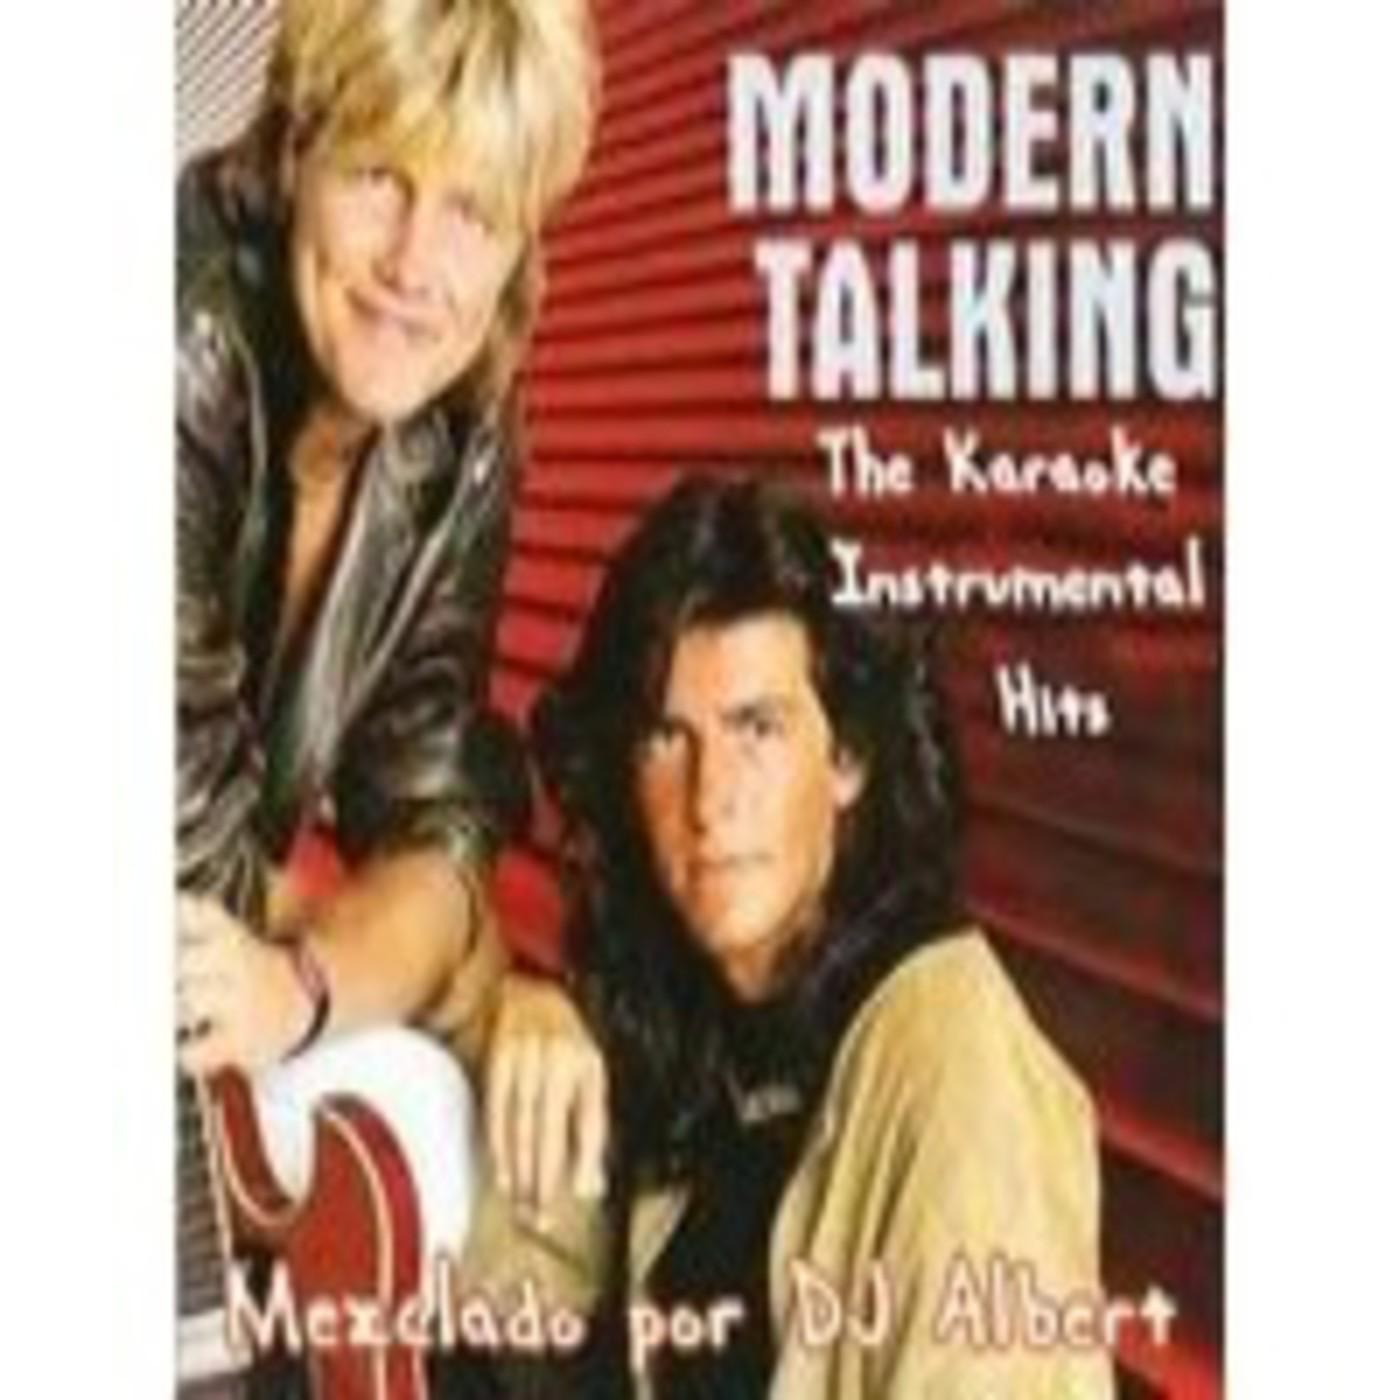 modern talking the karaoke instrumental hits mezclado por dj albert mp3 en sessions dj albert